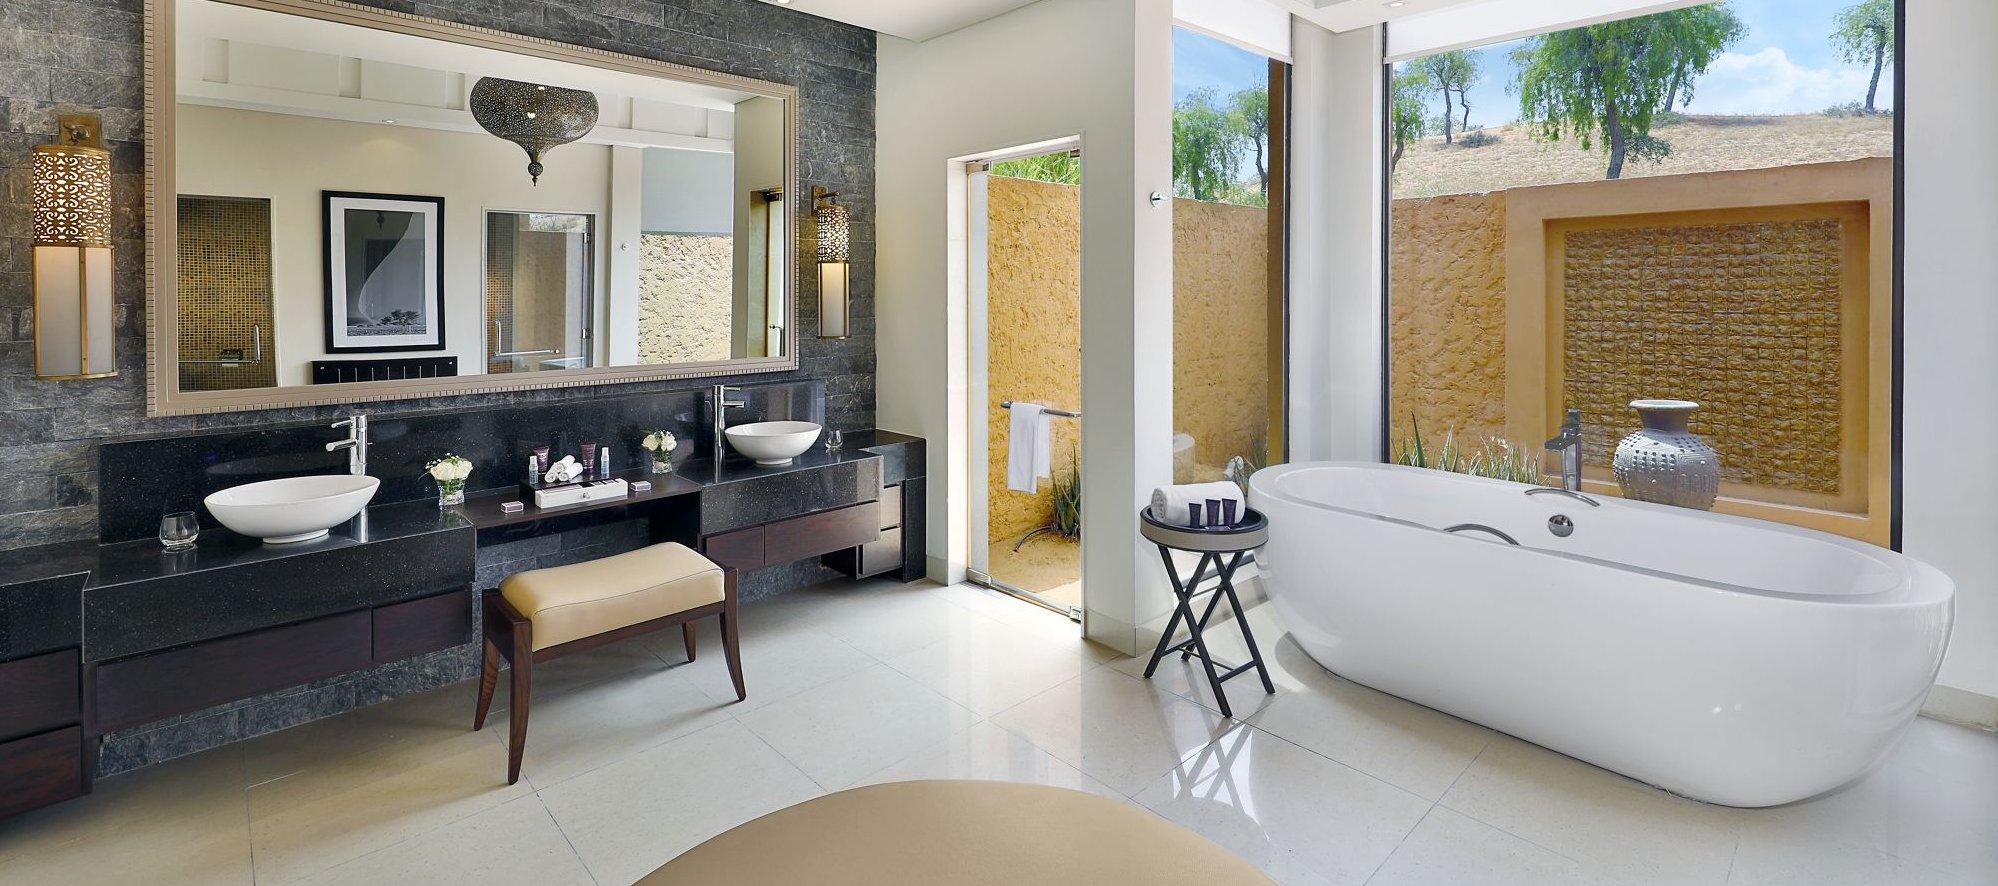 luxury-al-wadi-desert-hotel